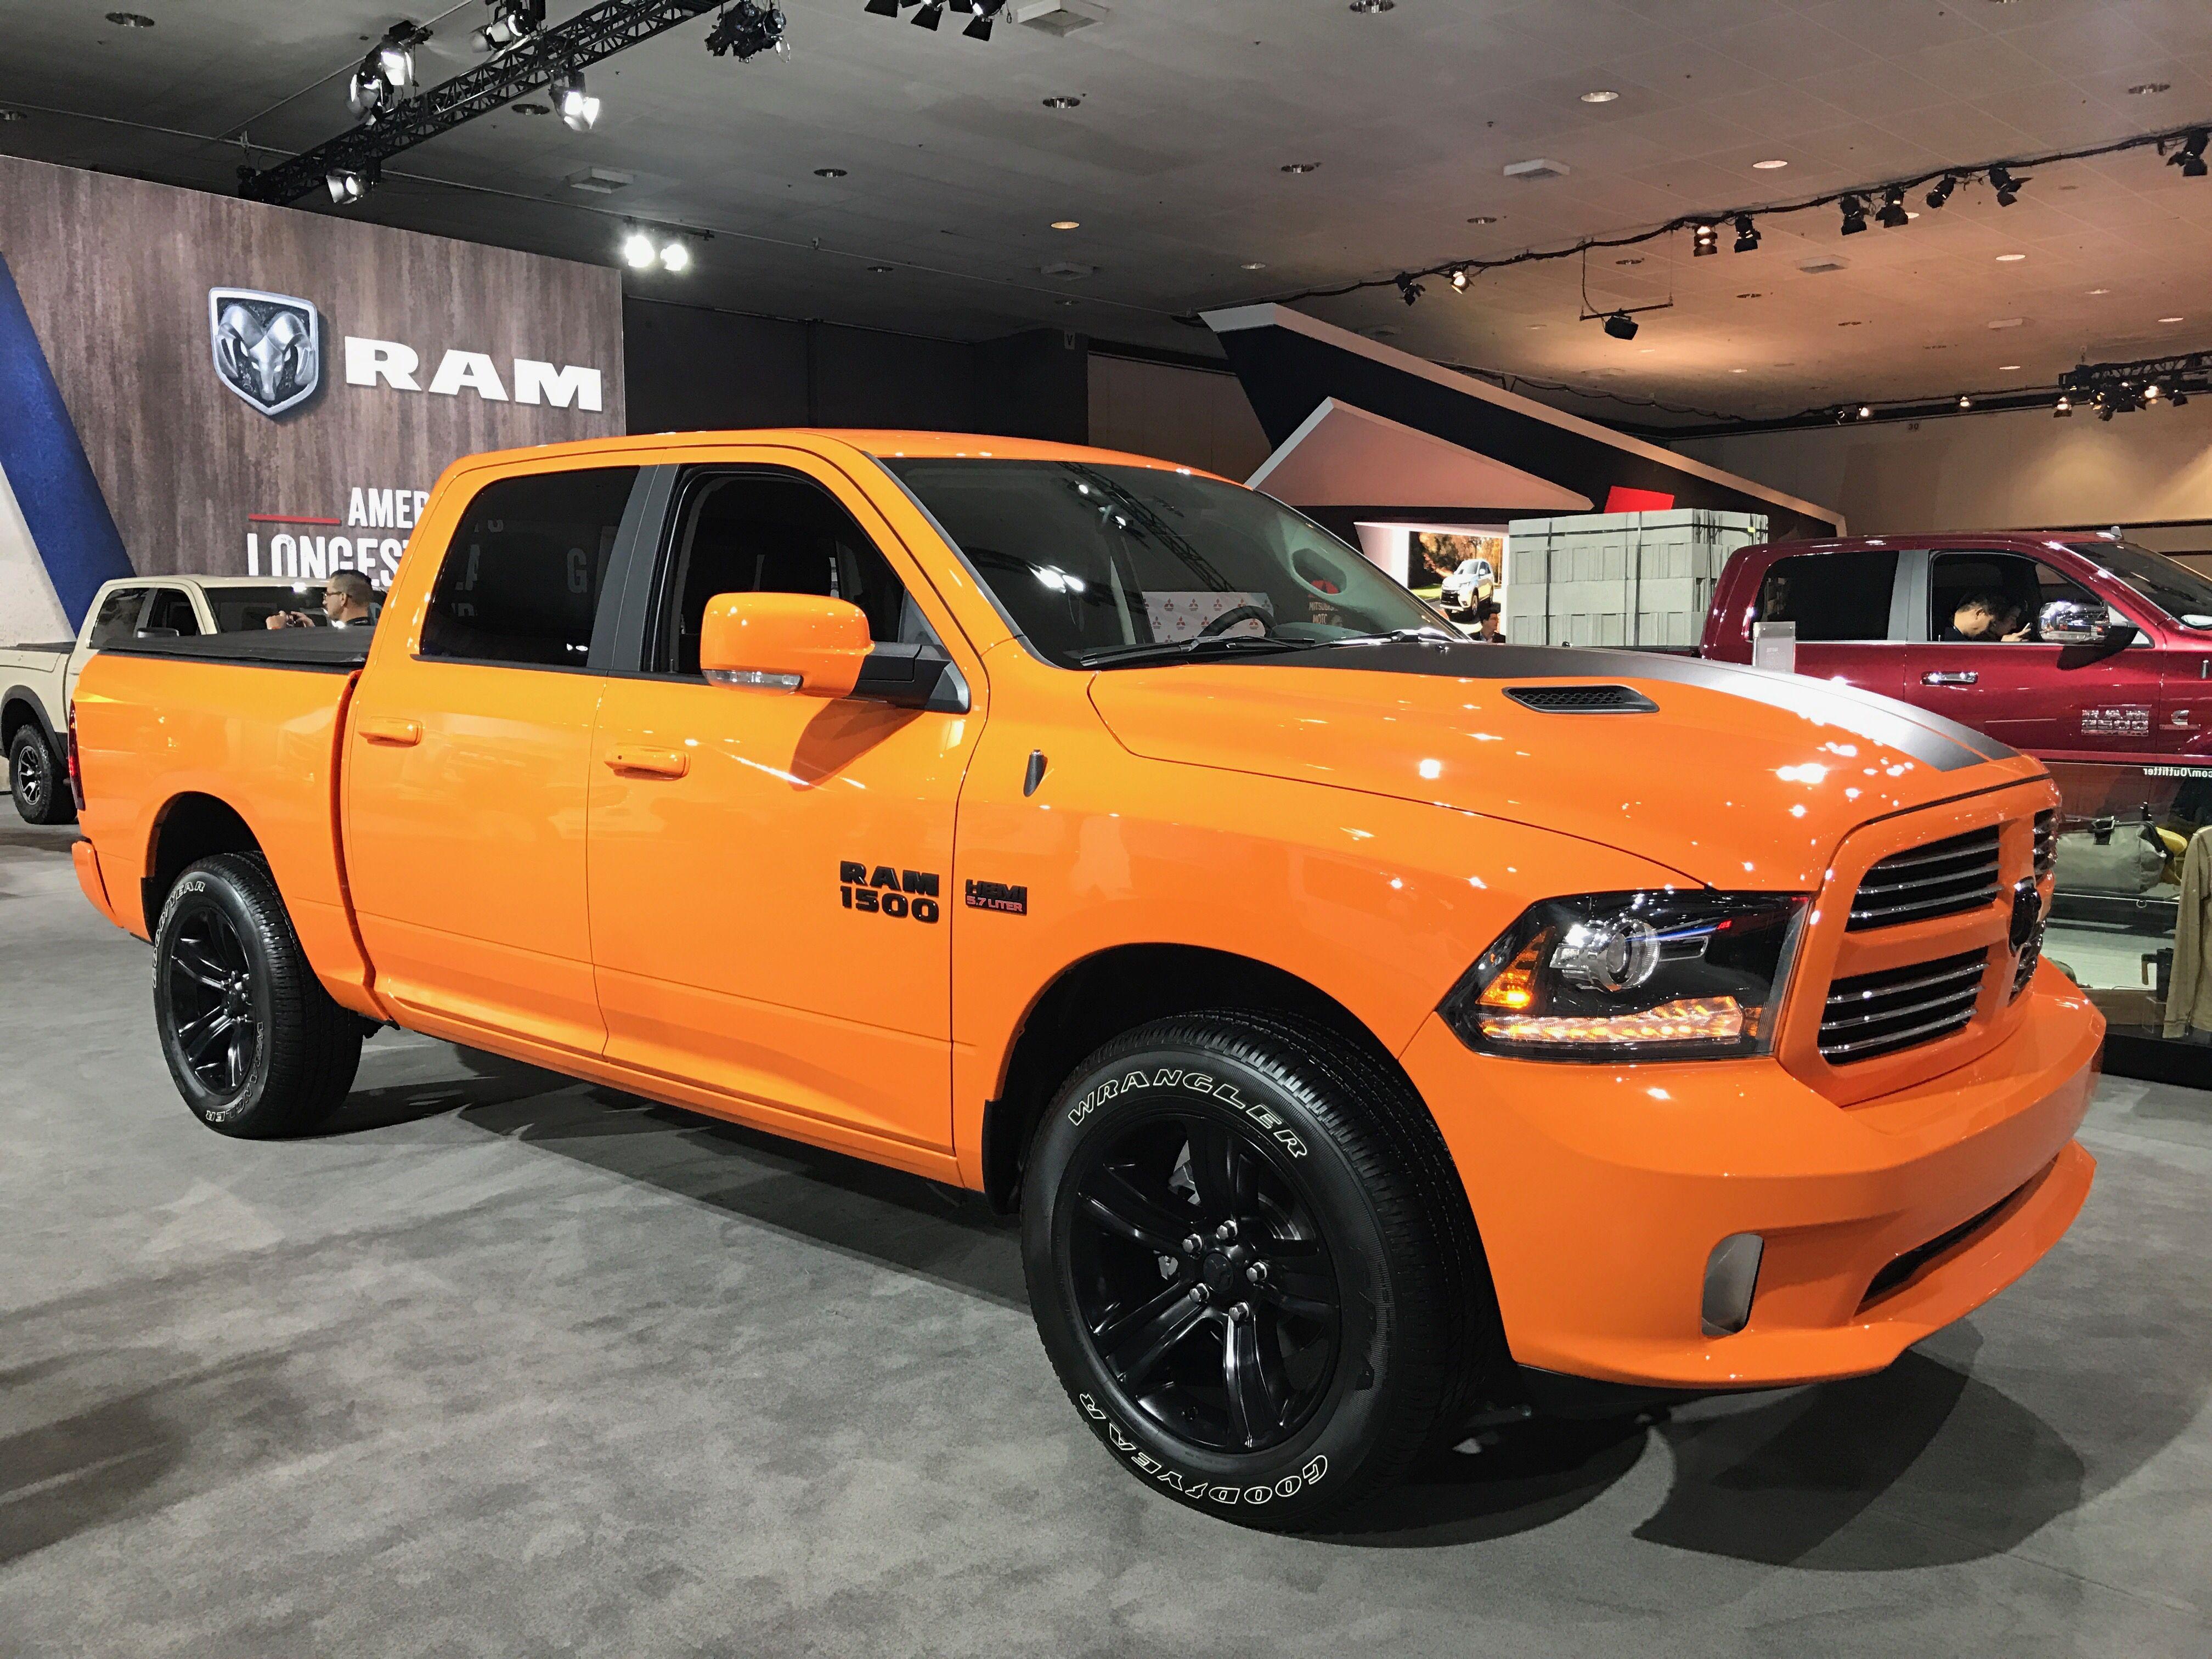 2017 ram 1500 ignition orange 5 7l hemi laautoshow trucks trucks pinterest dodge rams. Black Bedroom Furniture Sets. Home Design Ideas